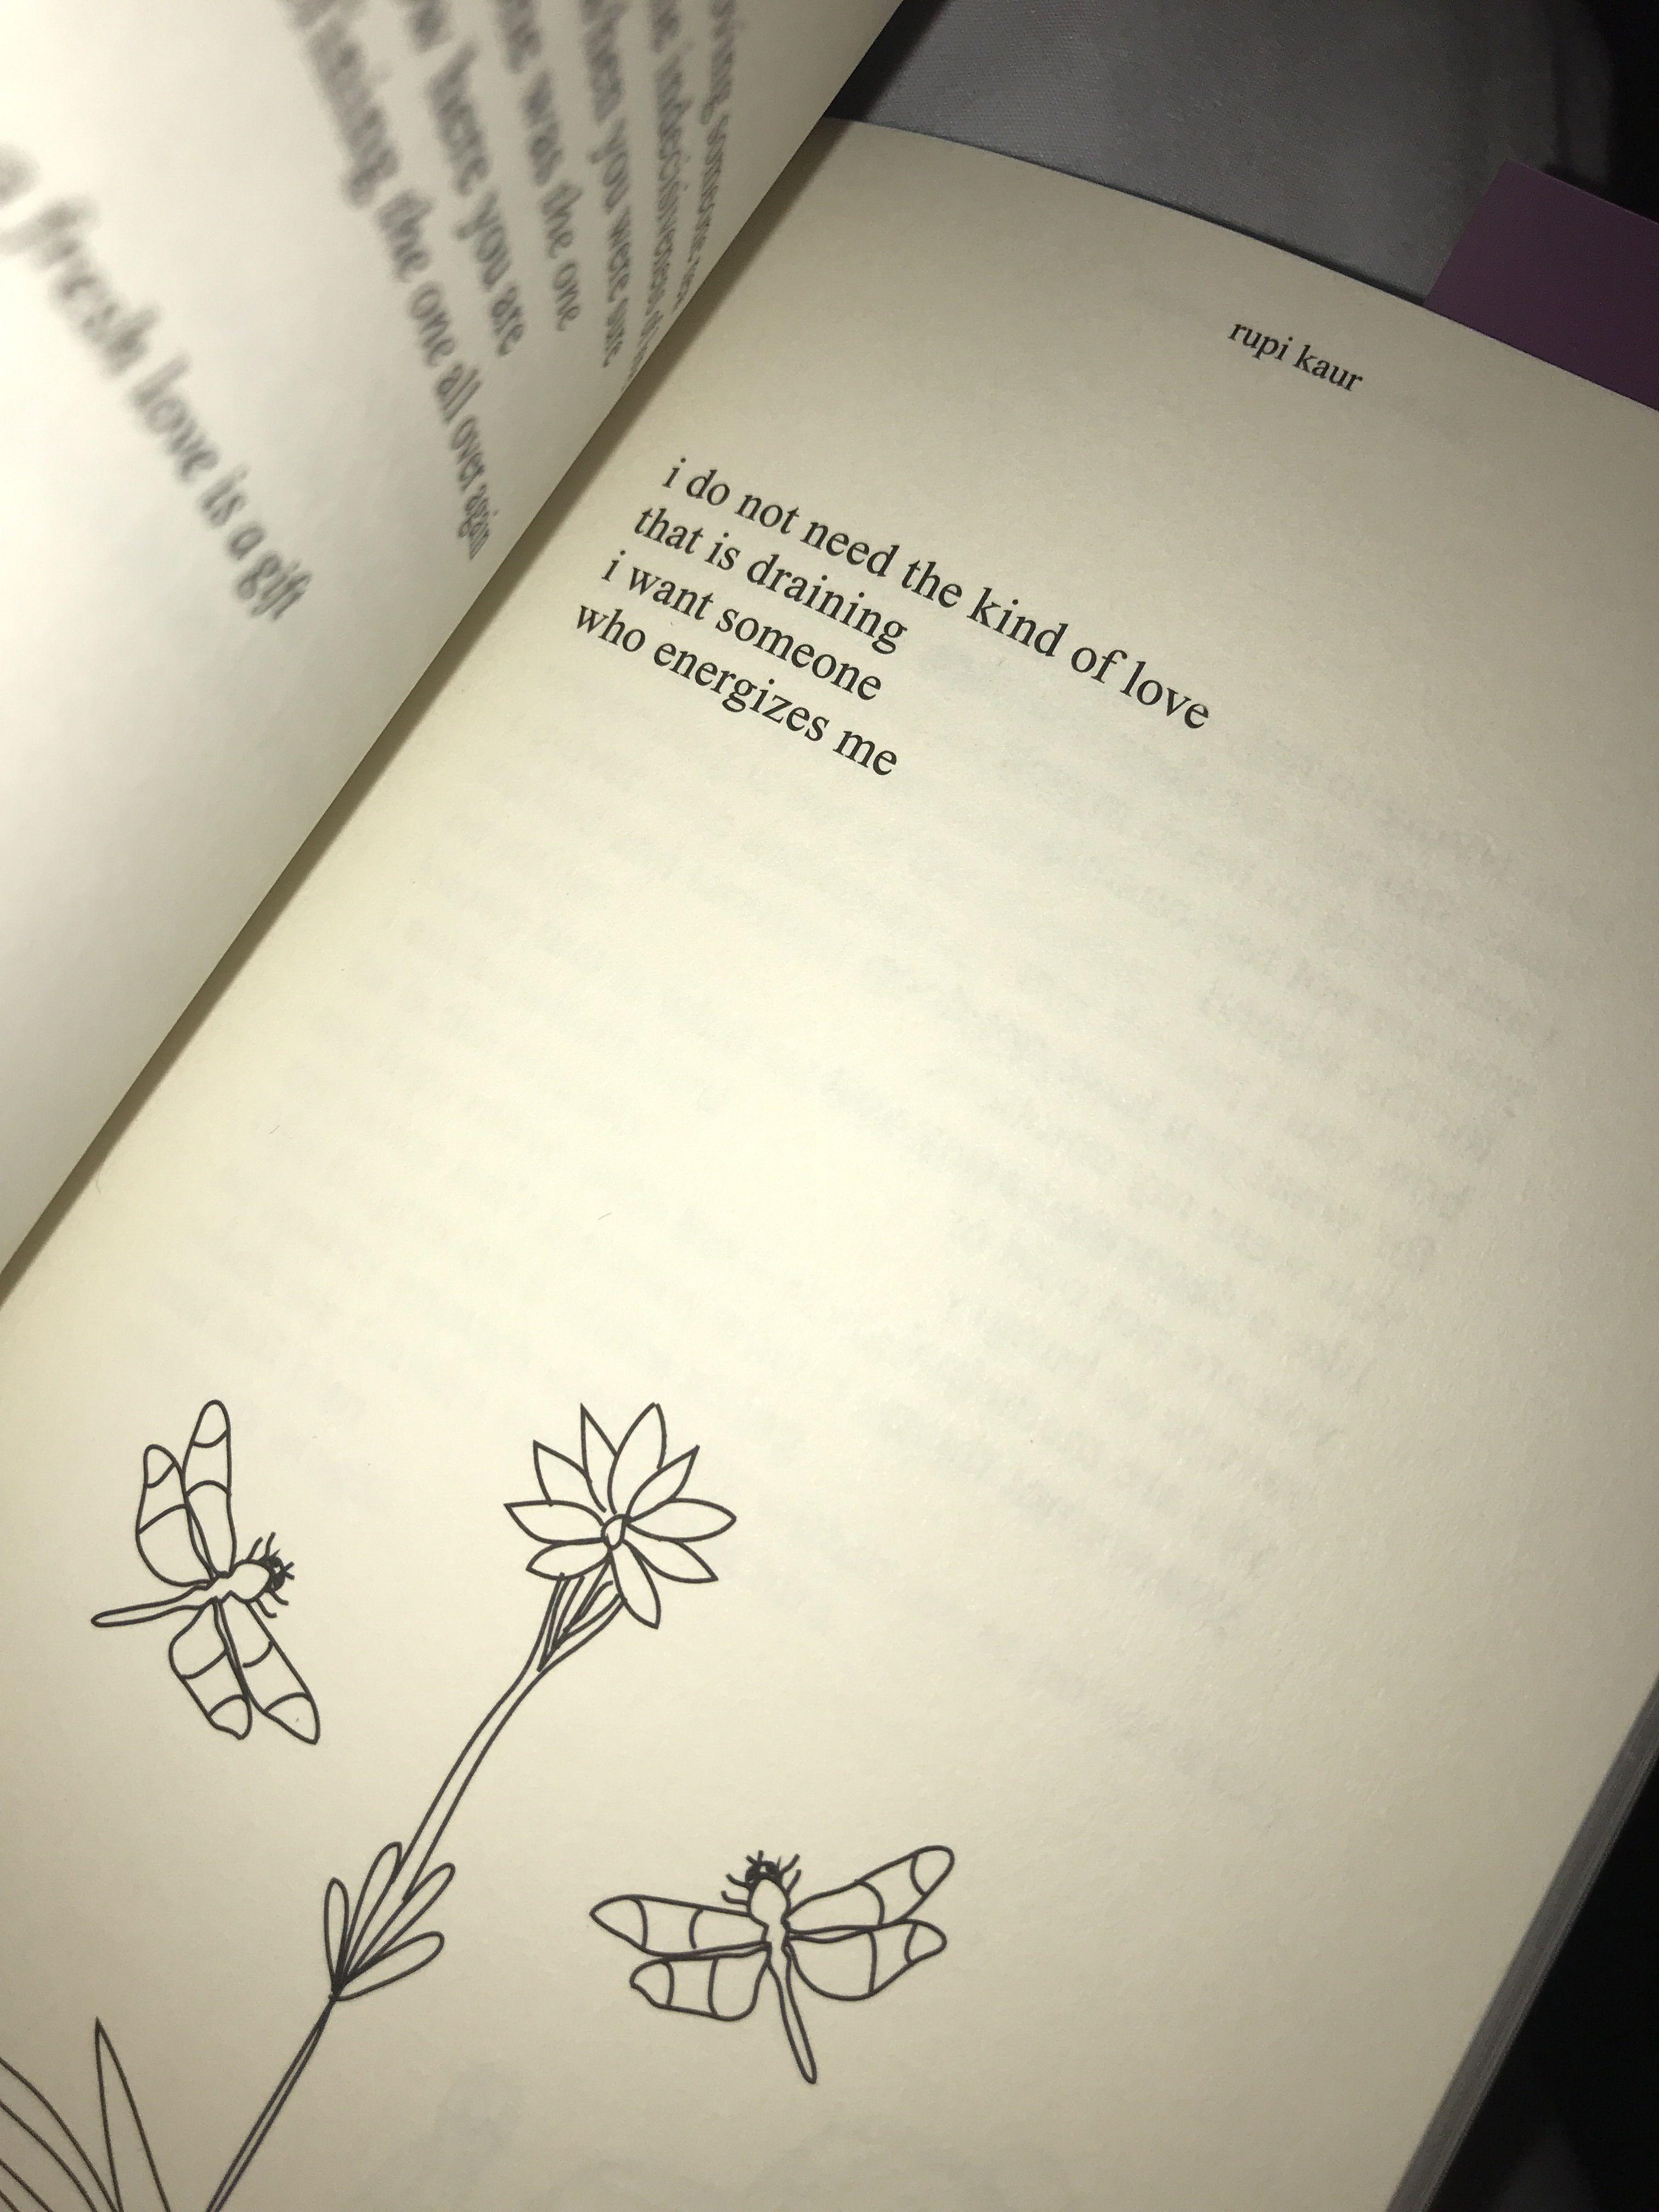 Pin by - ̗̀ jenni ̖́- on rupi kaur | Sunflower quotes ...